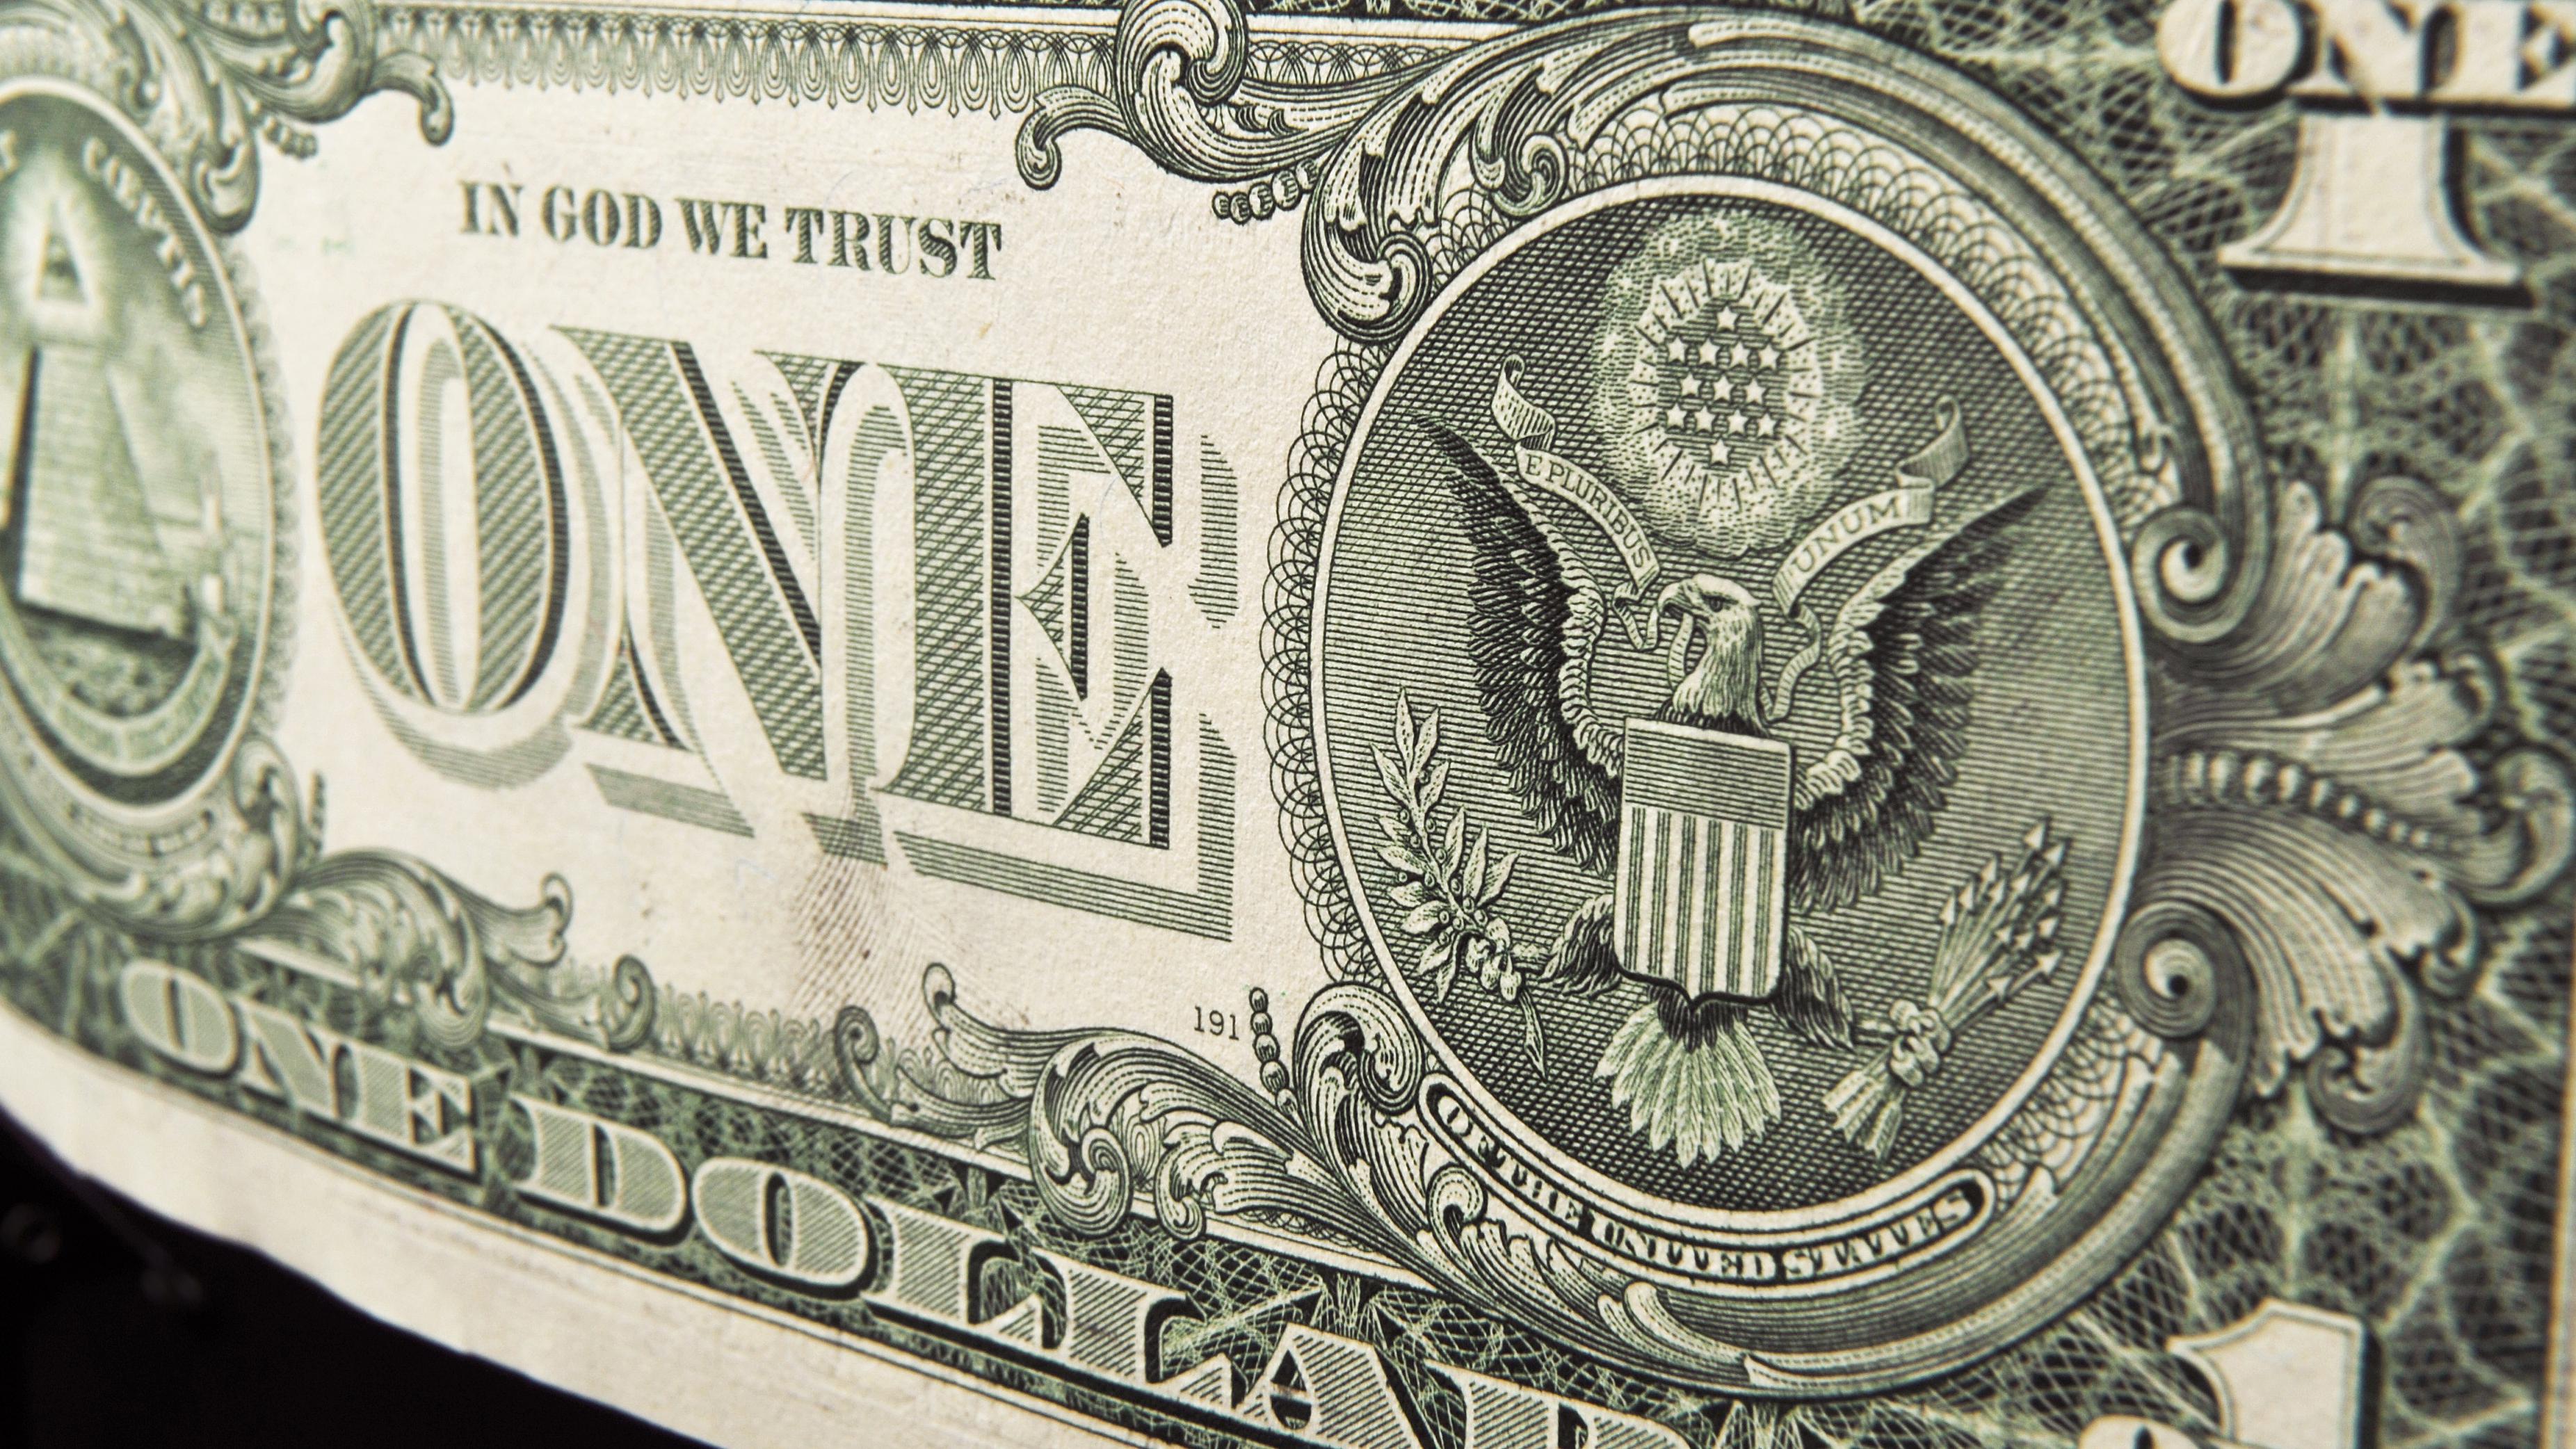 Dollar hd wallpaper background image 3704x2084 id - Dollar wallpaper ...